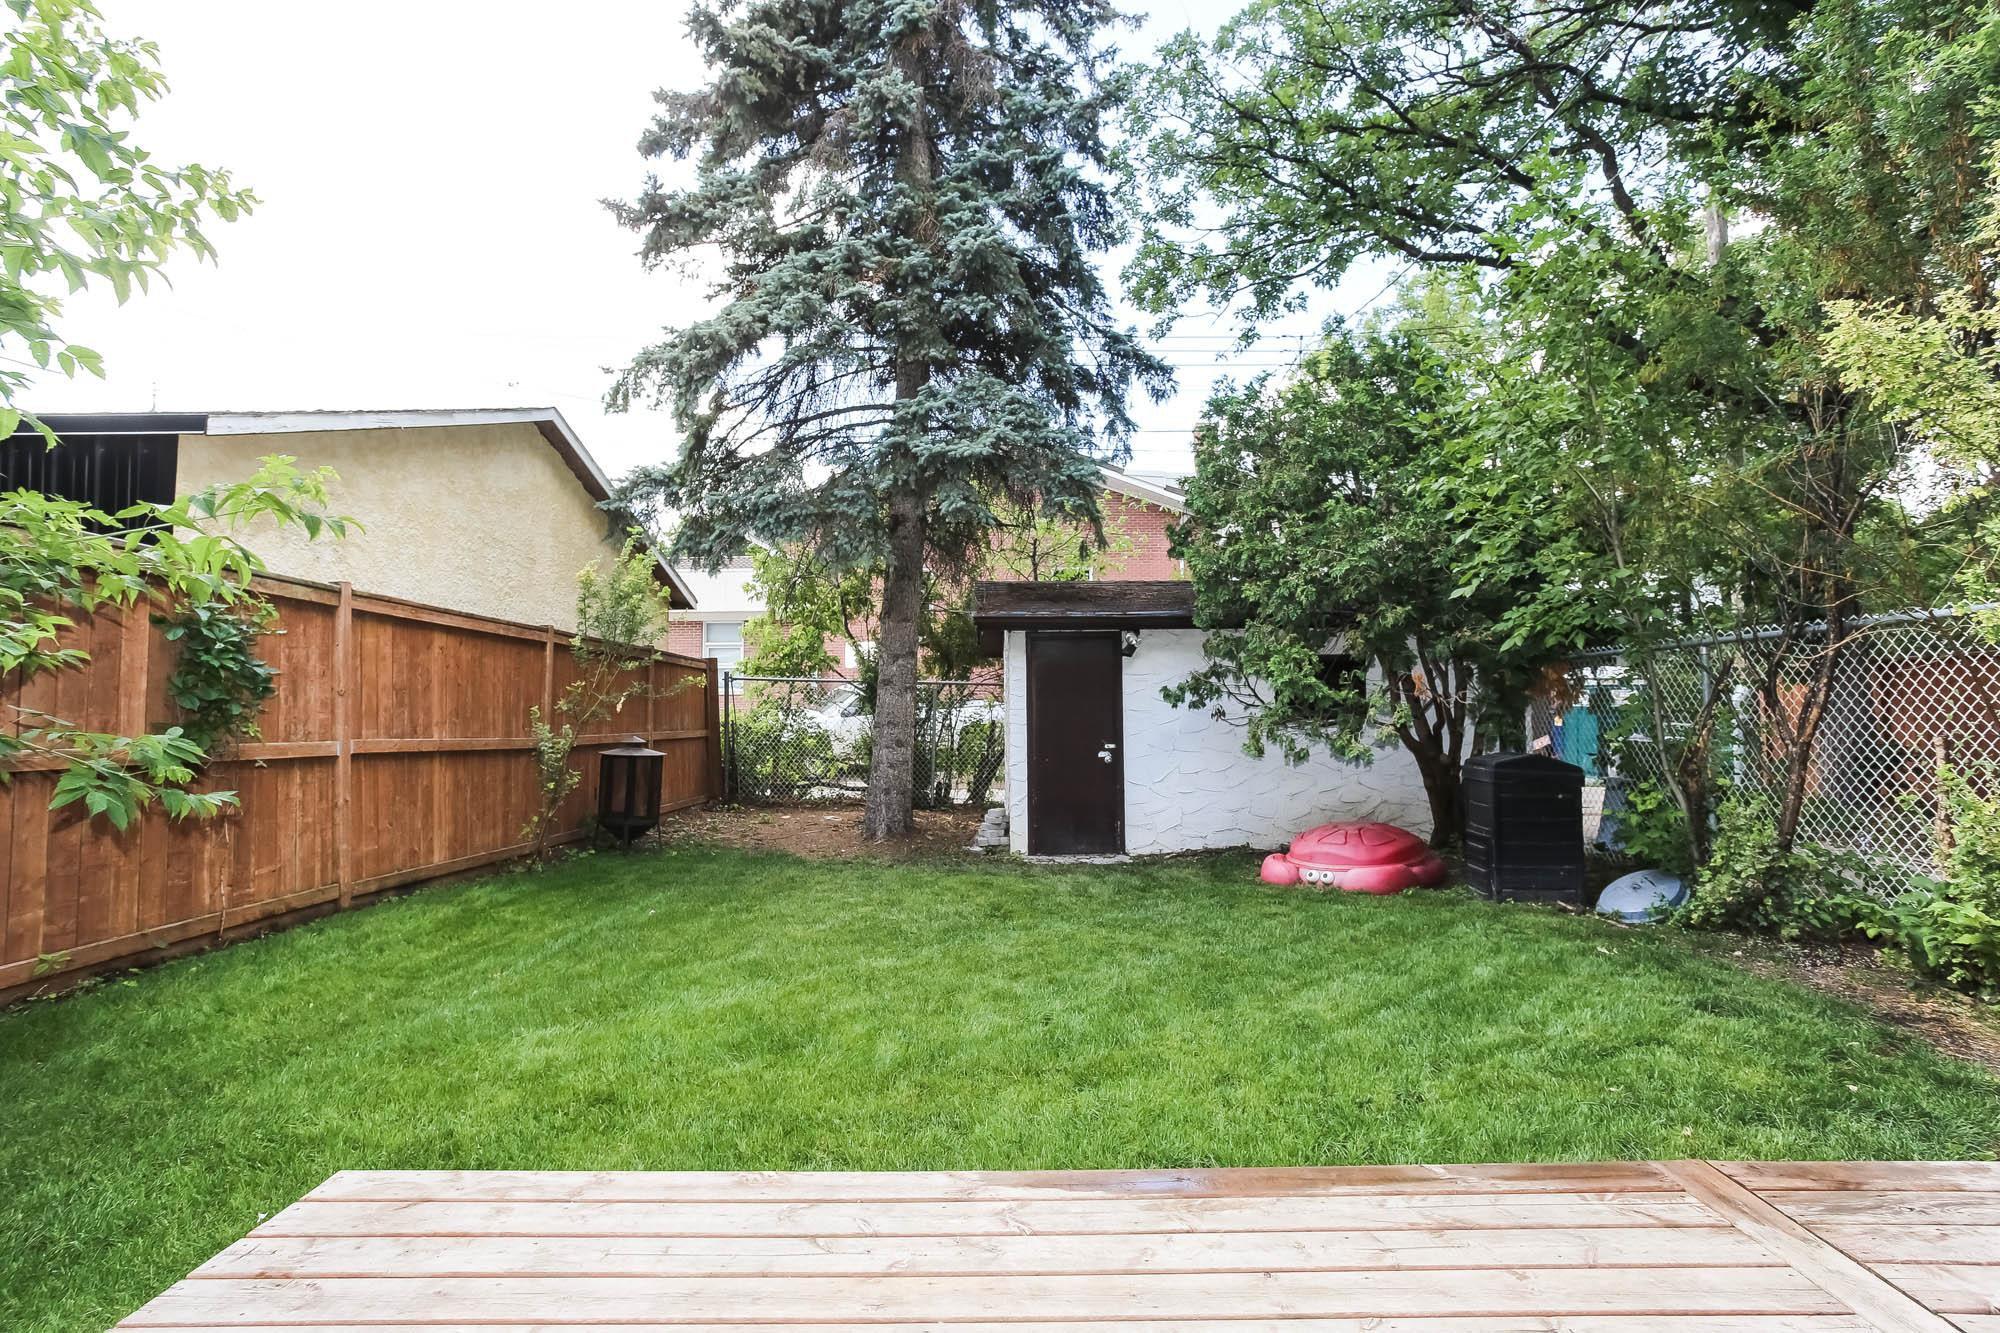 Photo 32: Photos: 155 Borebank Street in Winnipeg: River Heights Single Family Detached for sale (1C)  : MLS®# 202017166